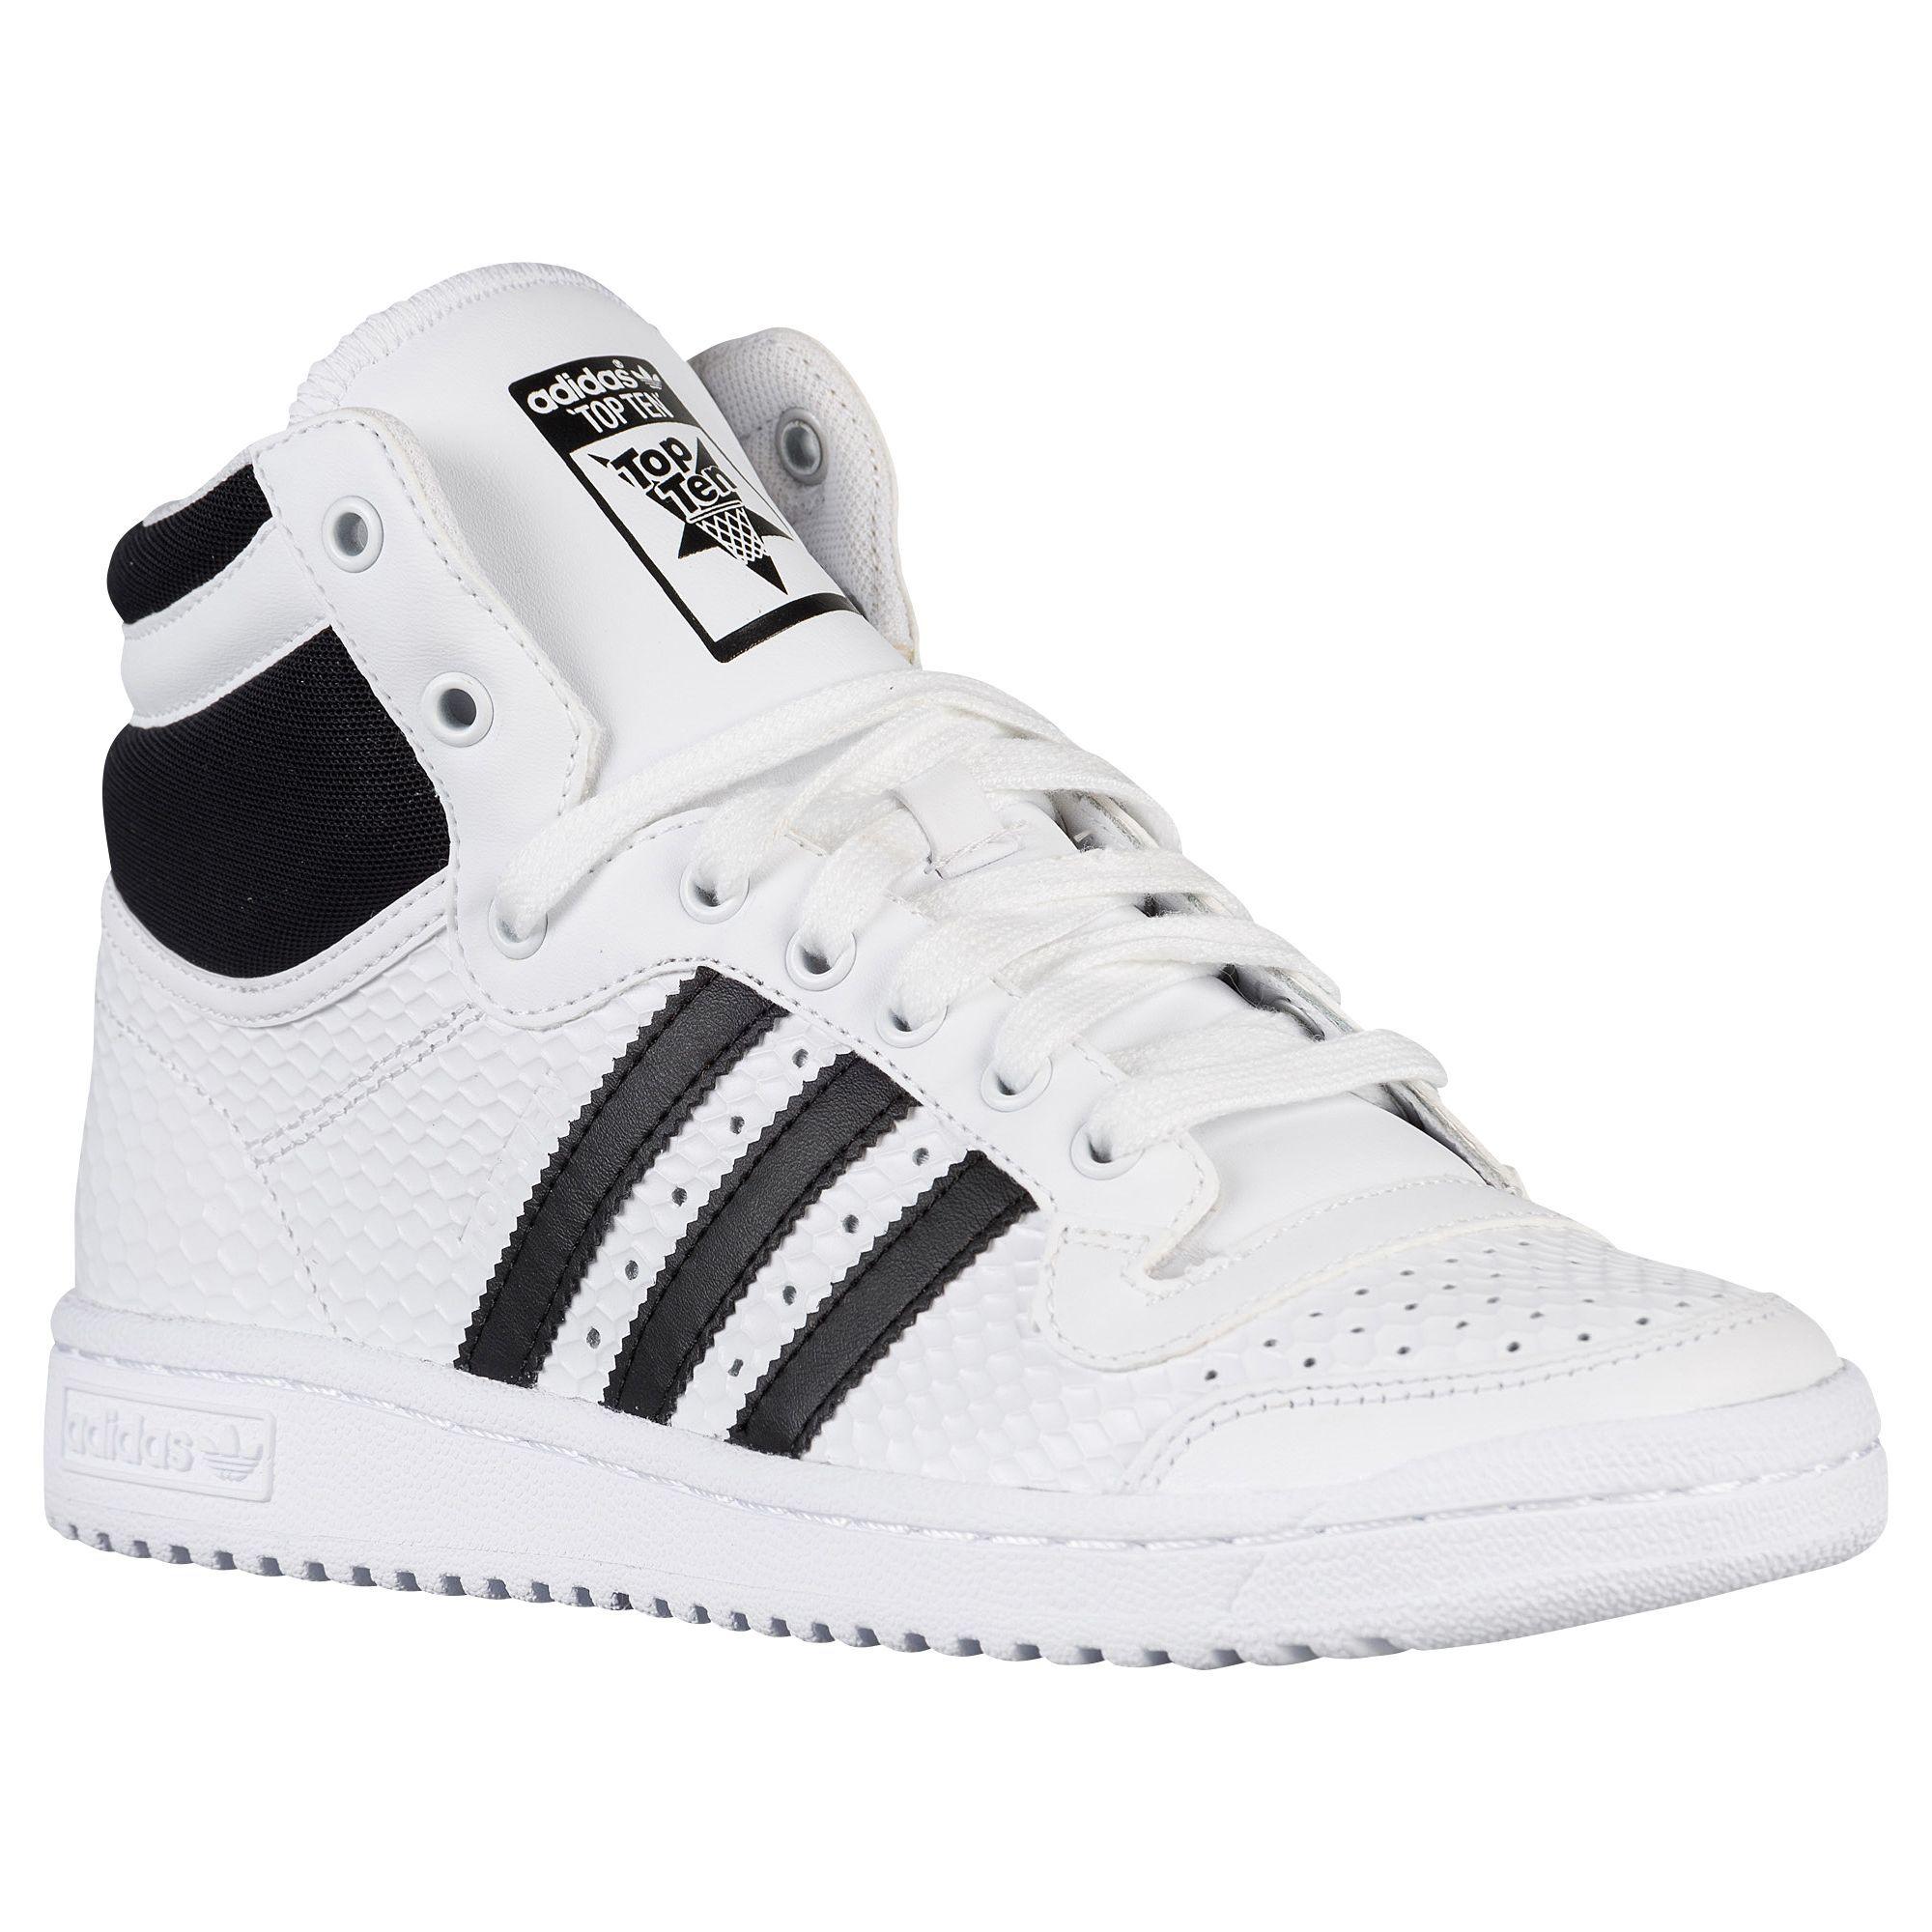 Buy Cheap Adidas Top Sale Discountdiscounts >A Off34% Discountdiscounts Sale a00f5f